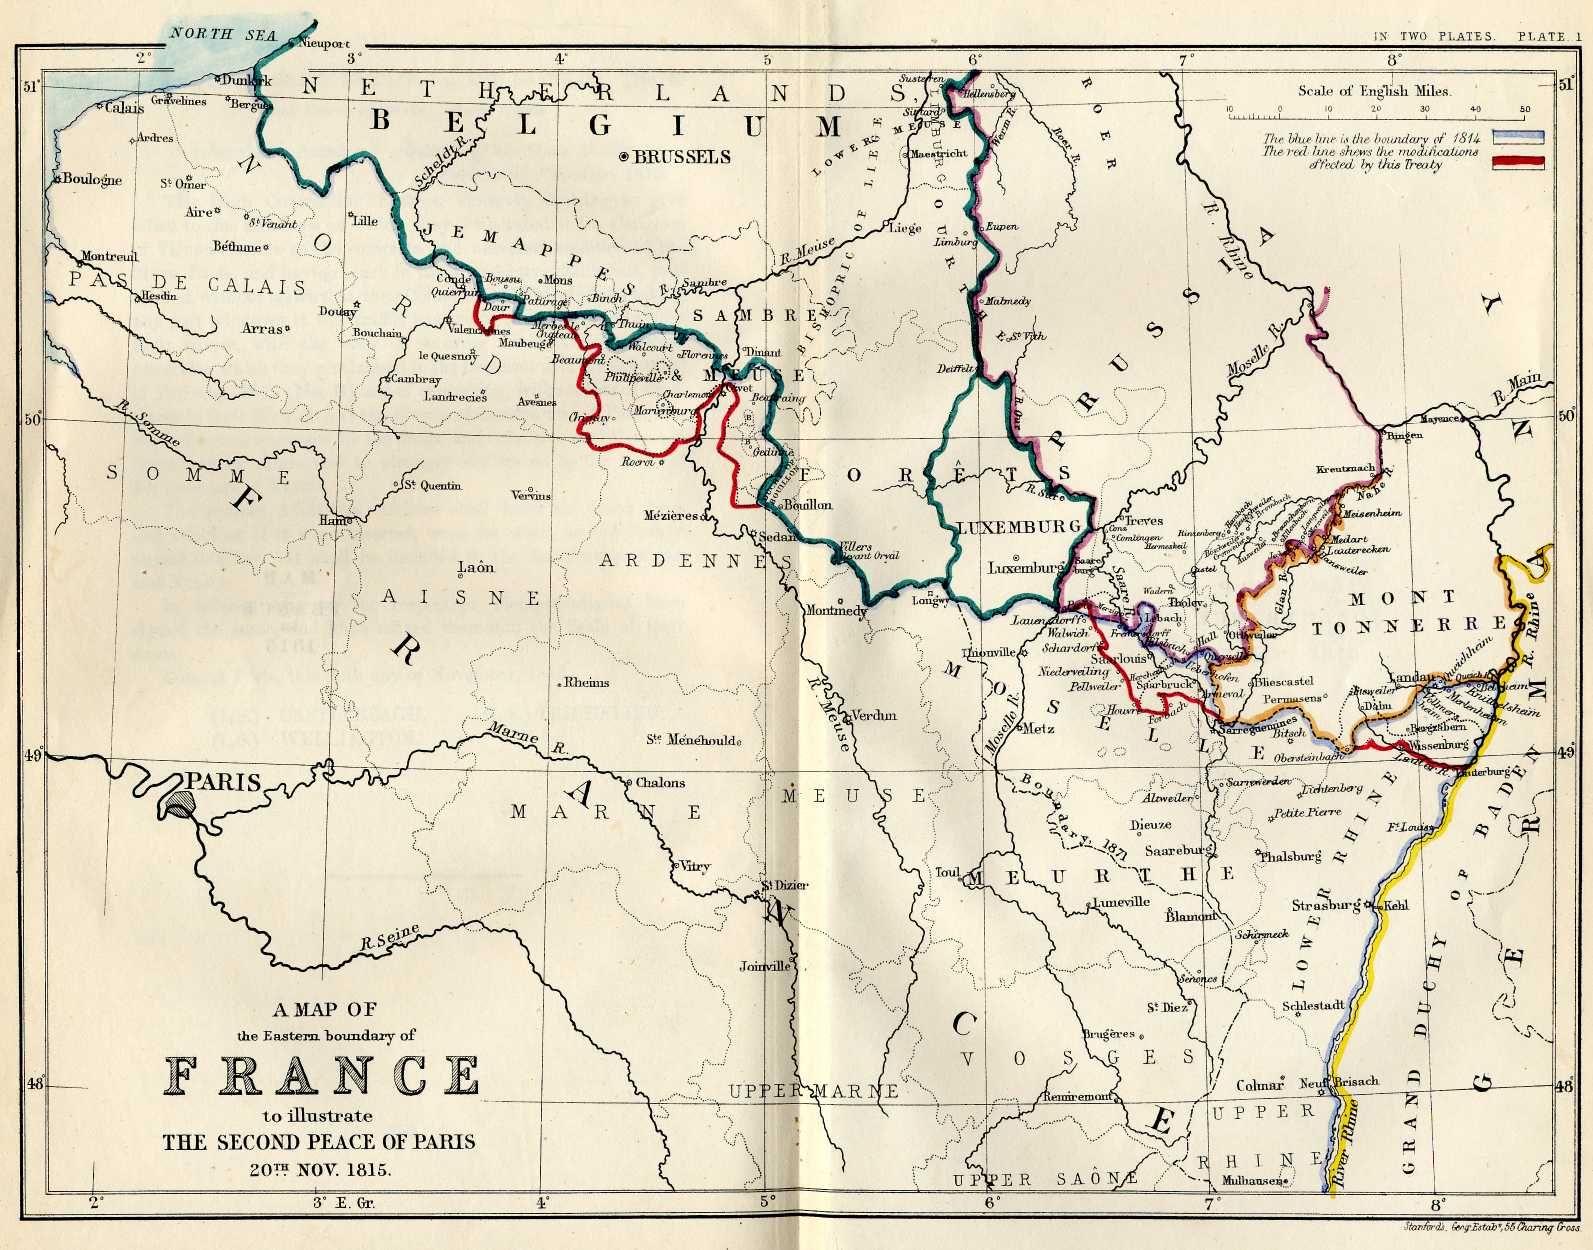 Northeastern France According To Treaties Of Paris Of 1814 1815